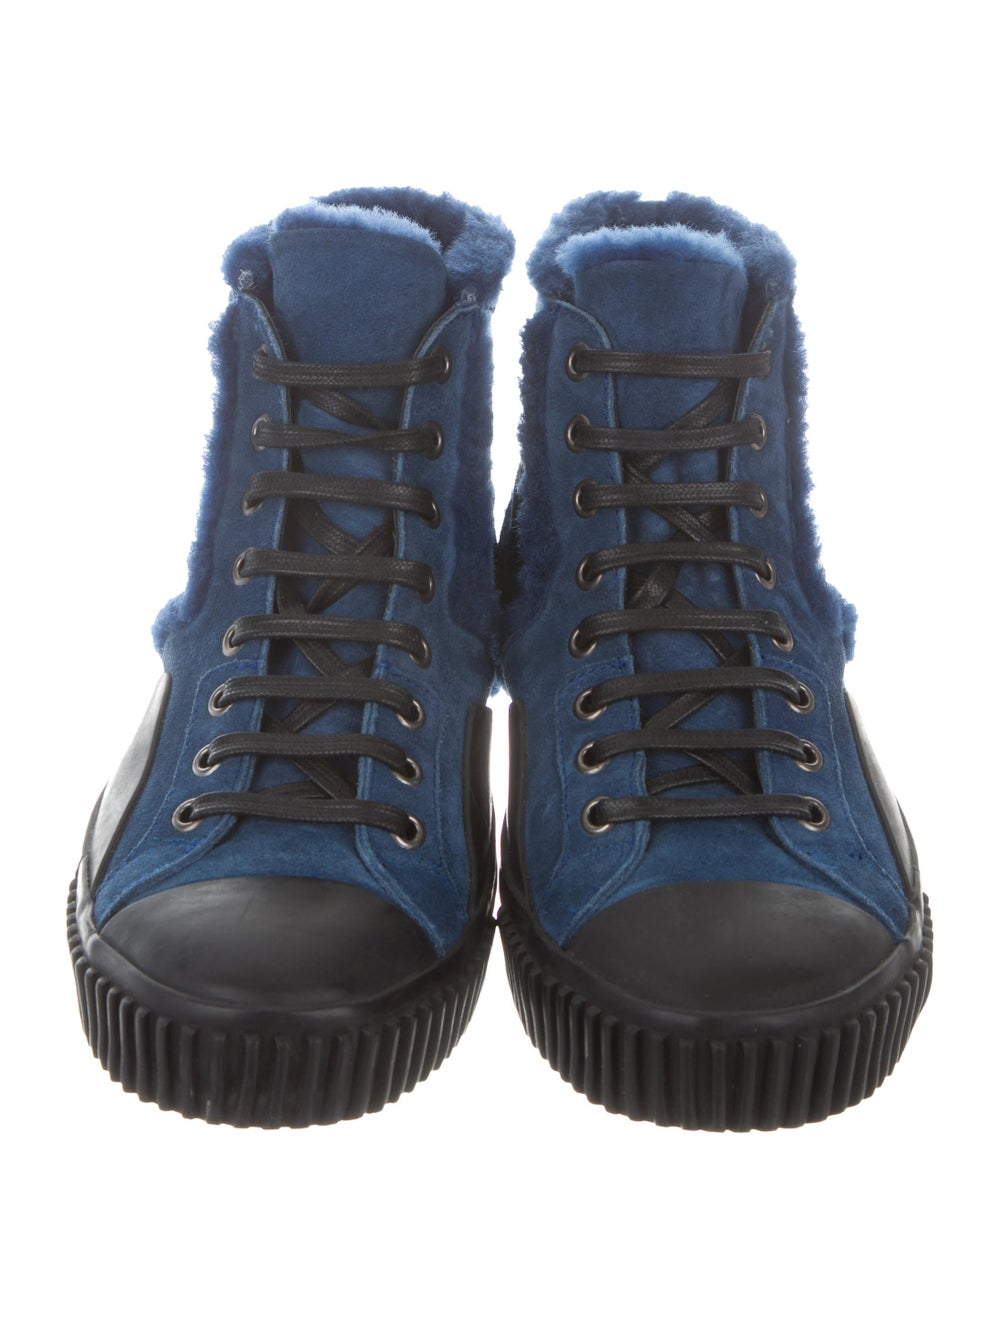 Balenciaga Cap-Toe Shearling-Trimmed Sneakers bla… - image 3